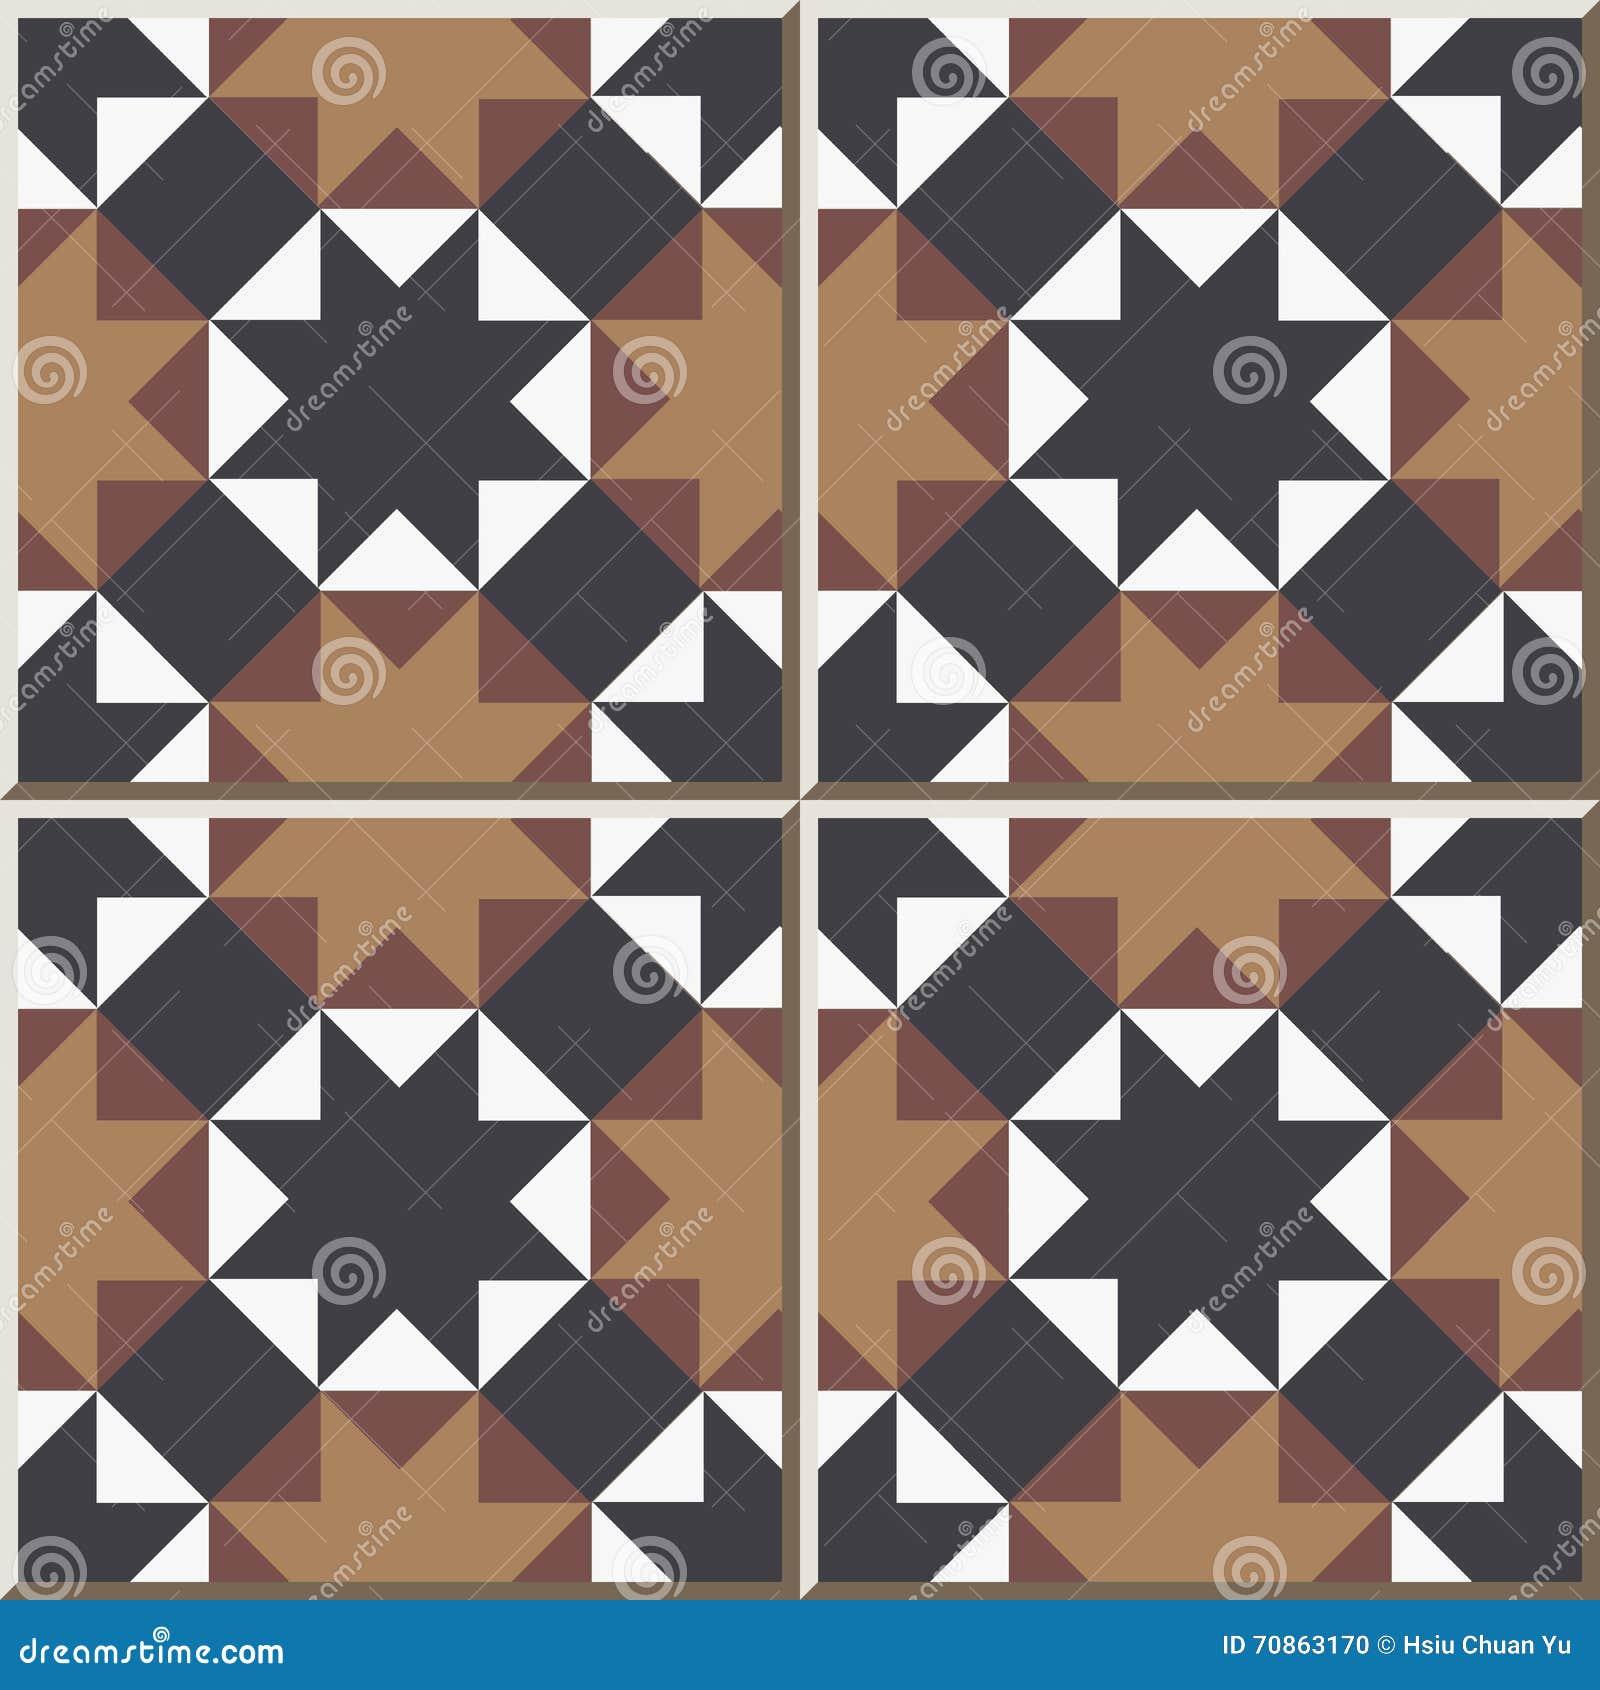 Ceramic Tile Pattern 323 Octagon Star Cross Triangle Geometry Stock